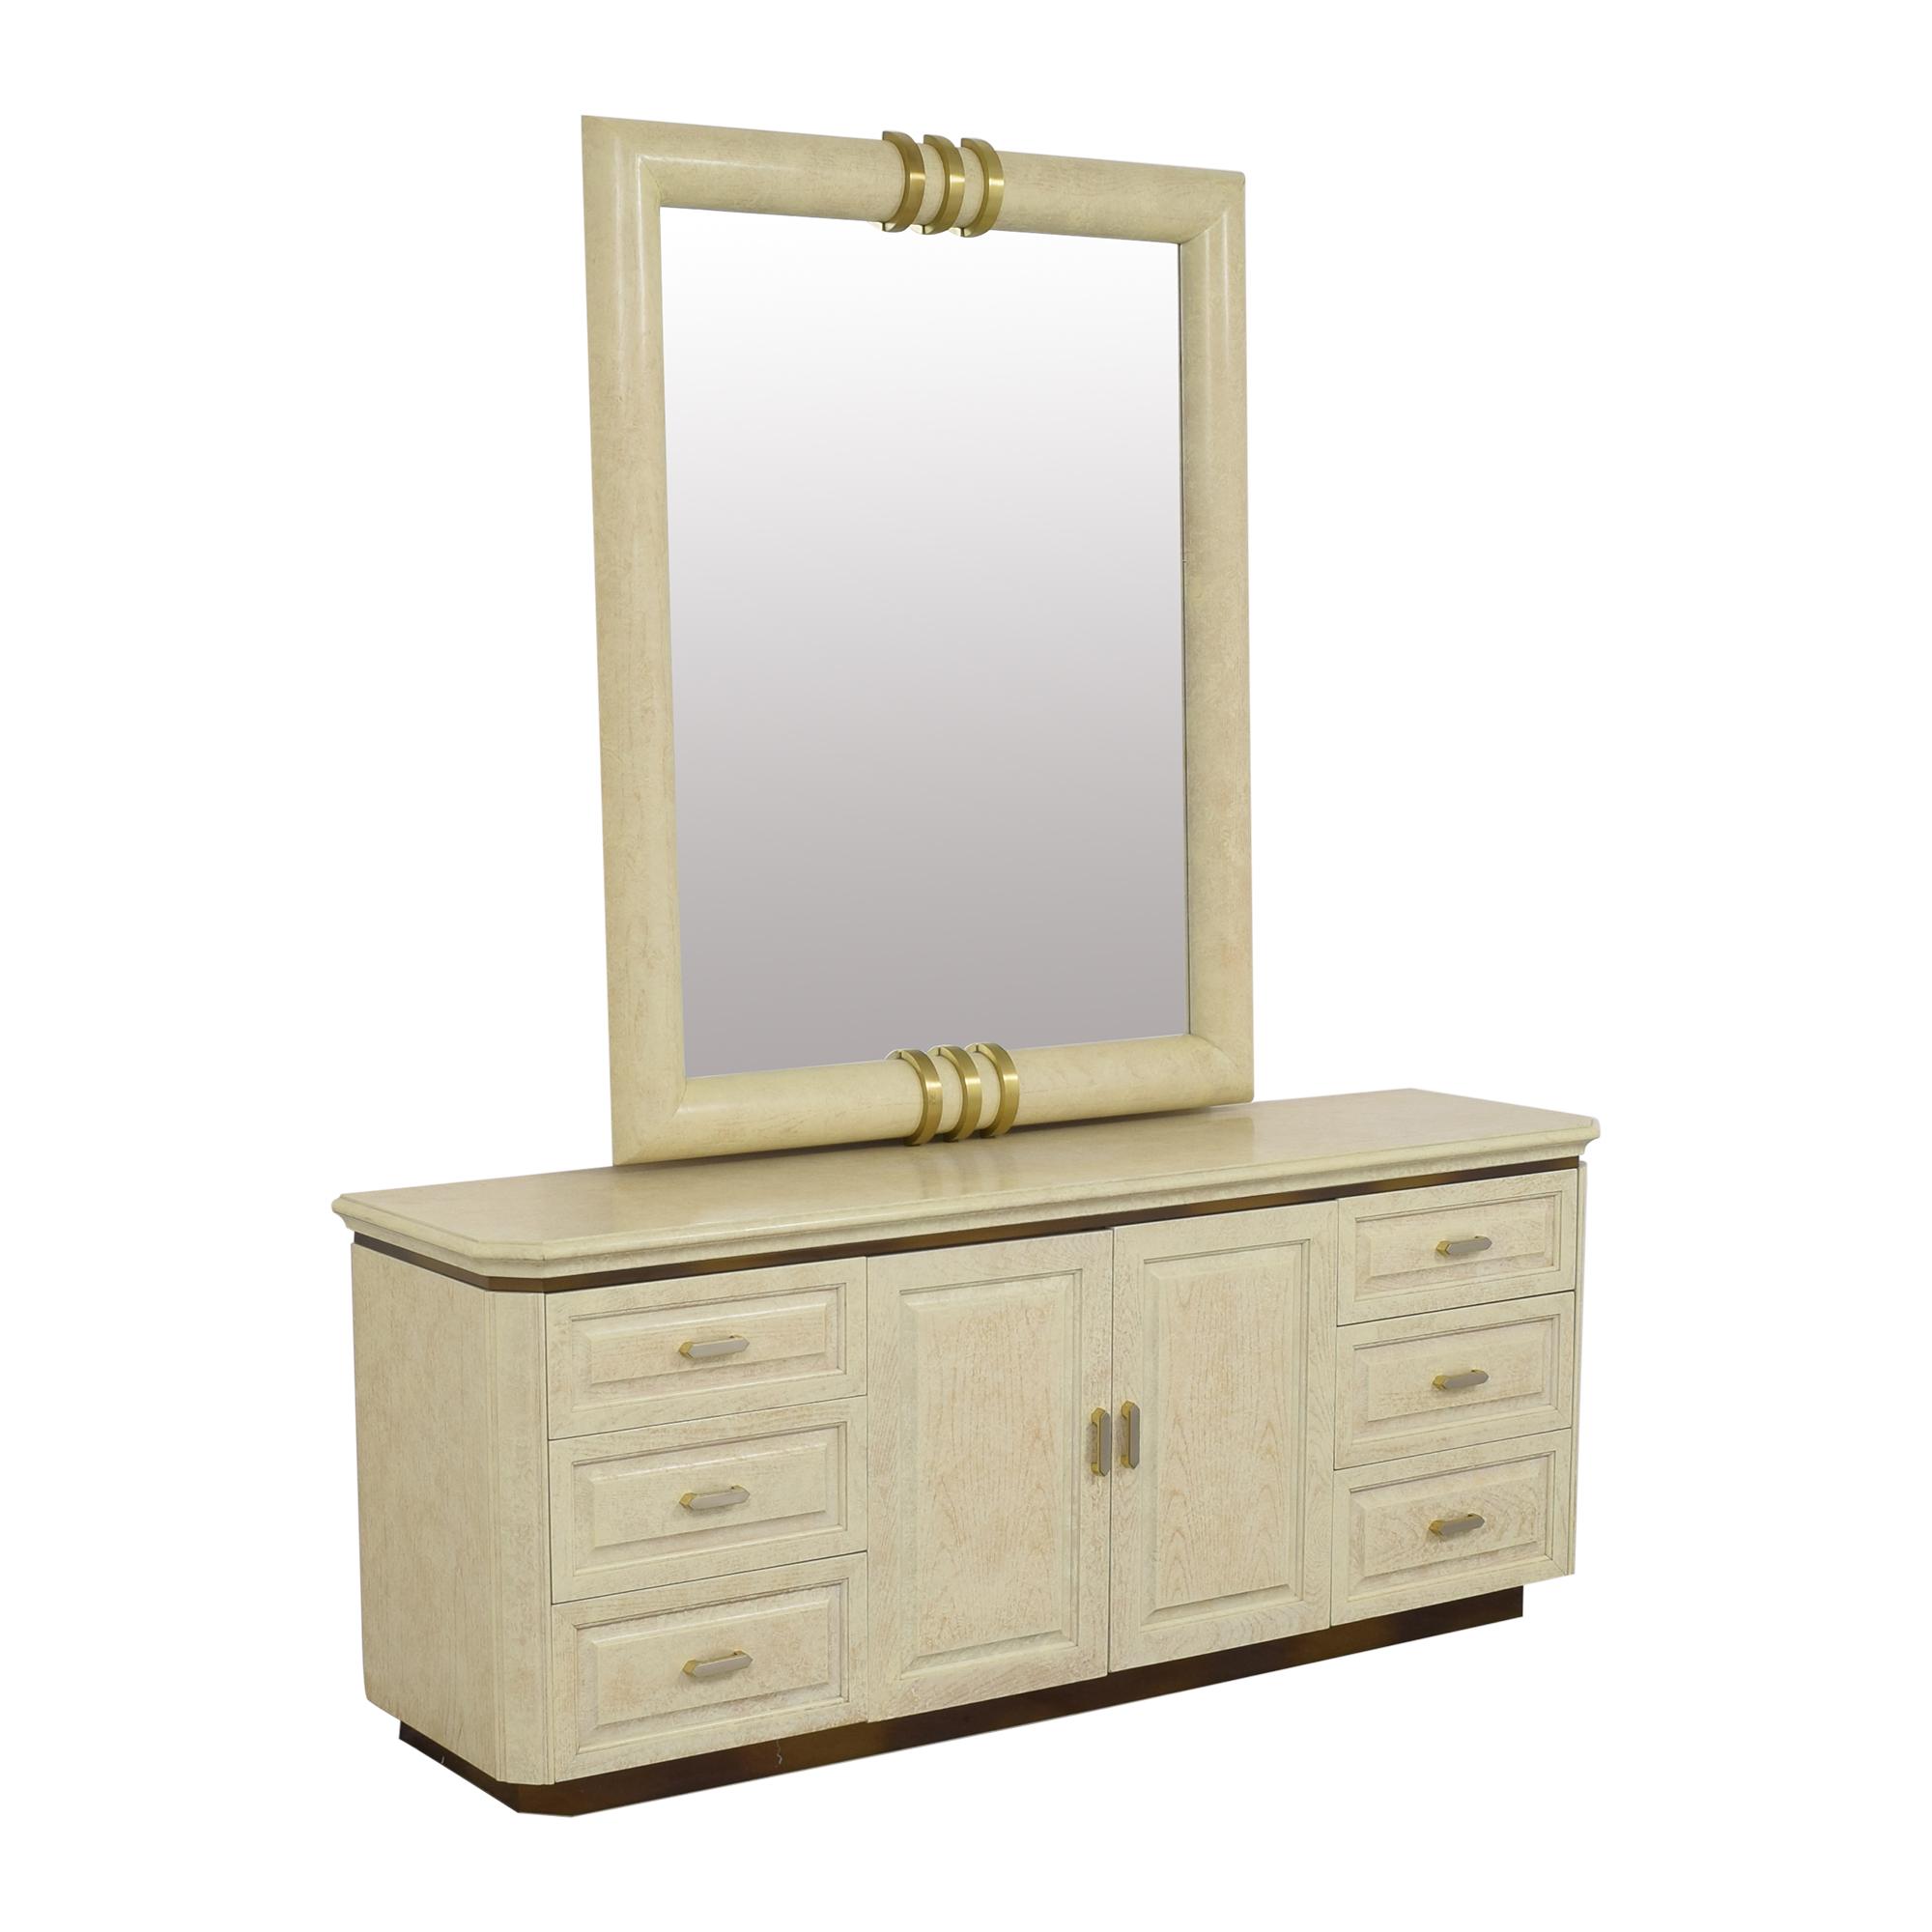 buy Henredon Art Deco Style Dresser and Mirror Henredon Furniture Decor